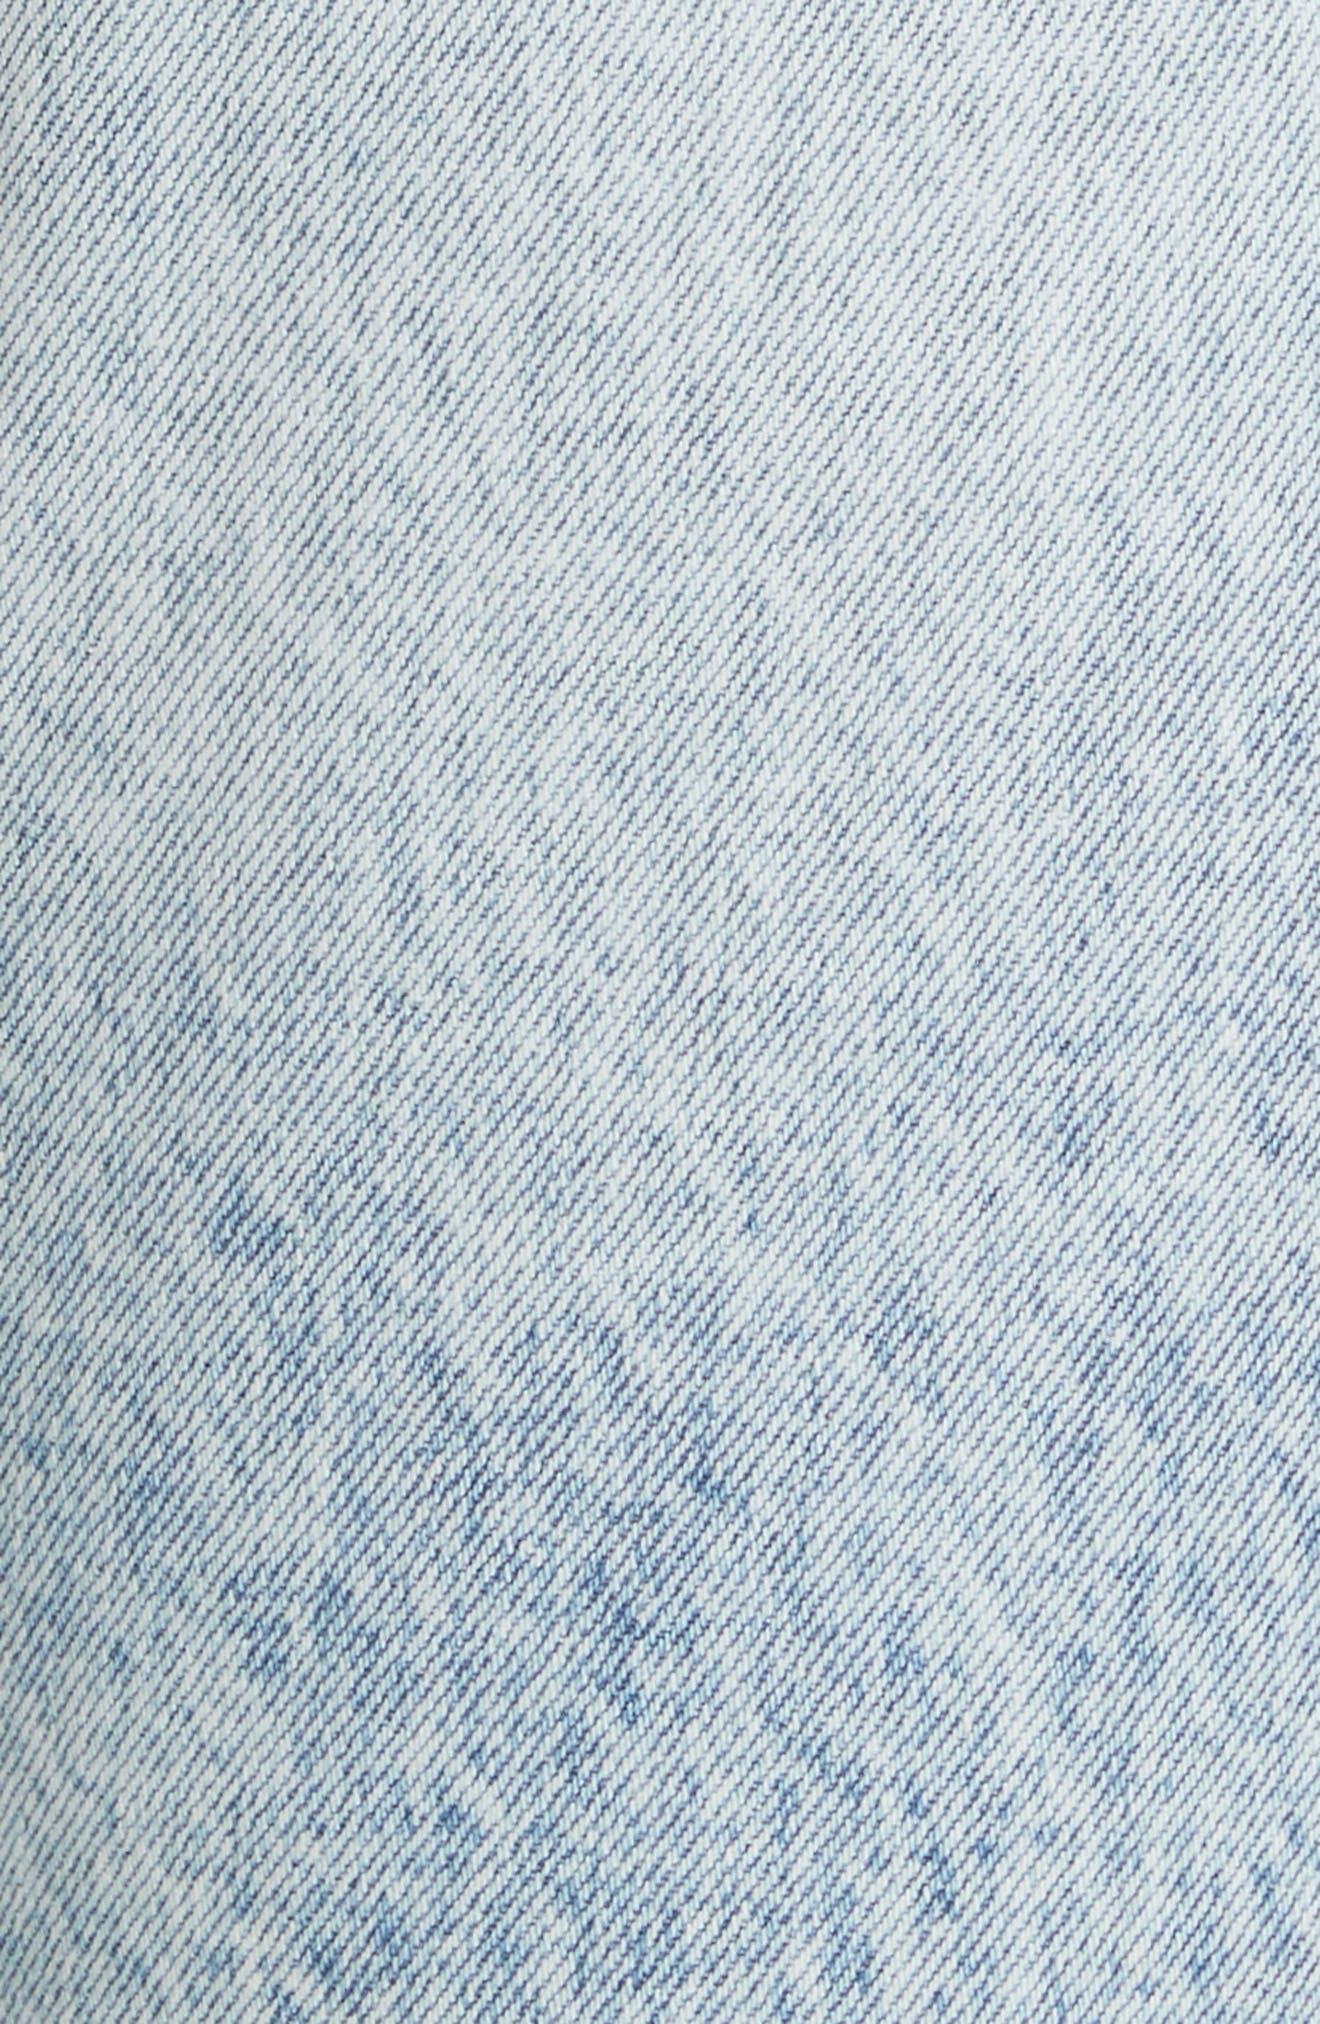 Karolina Ripped Skinny Jeans,                             Alternate thumbnail 5, color,                             Reactive